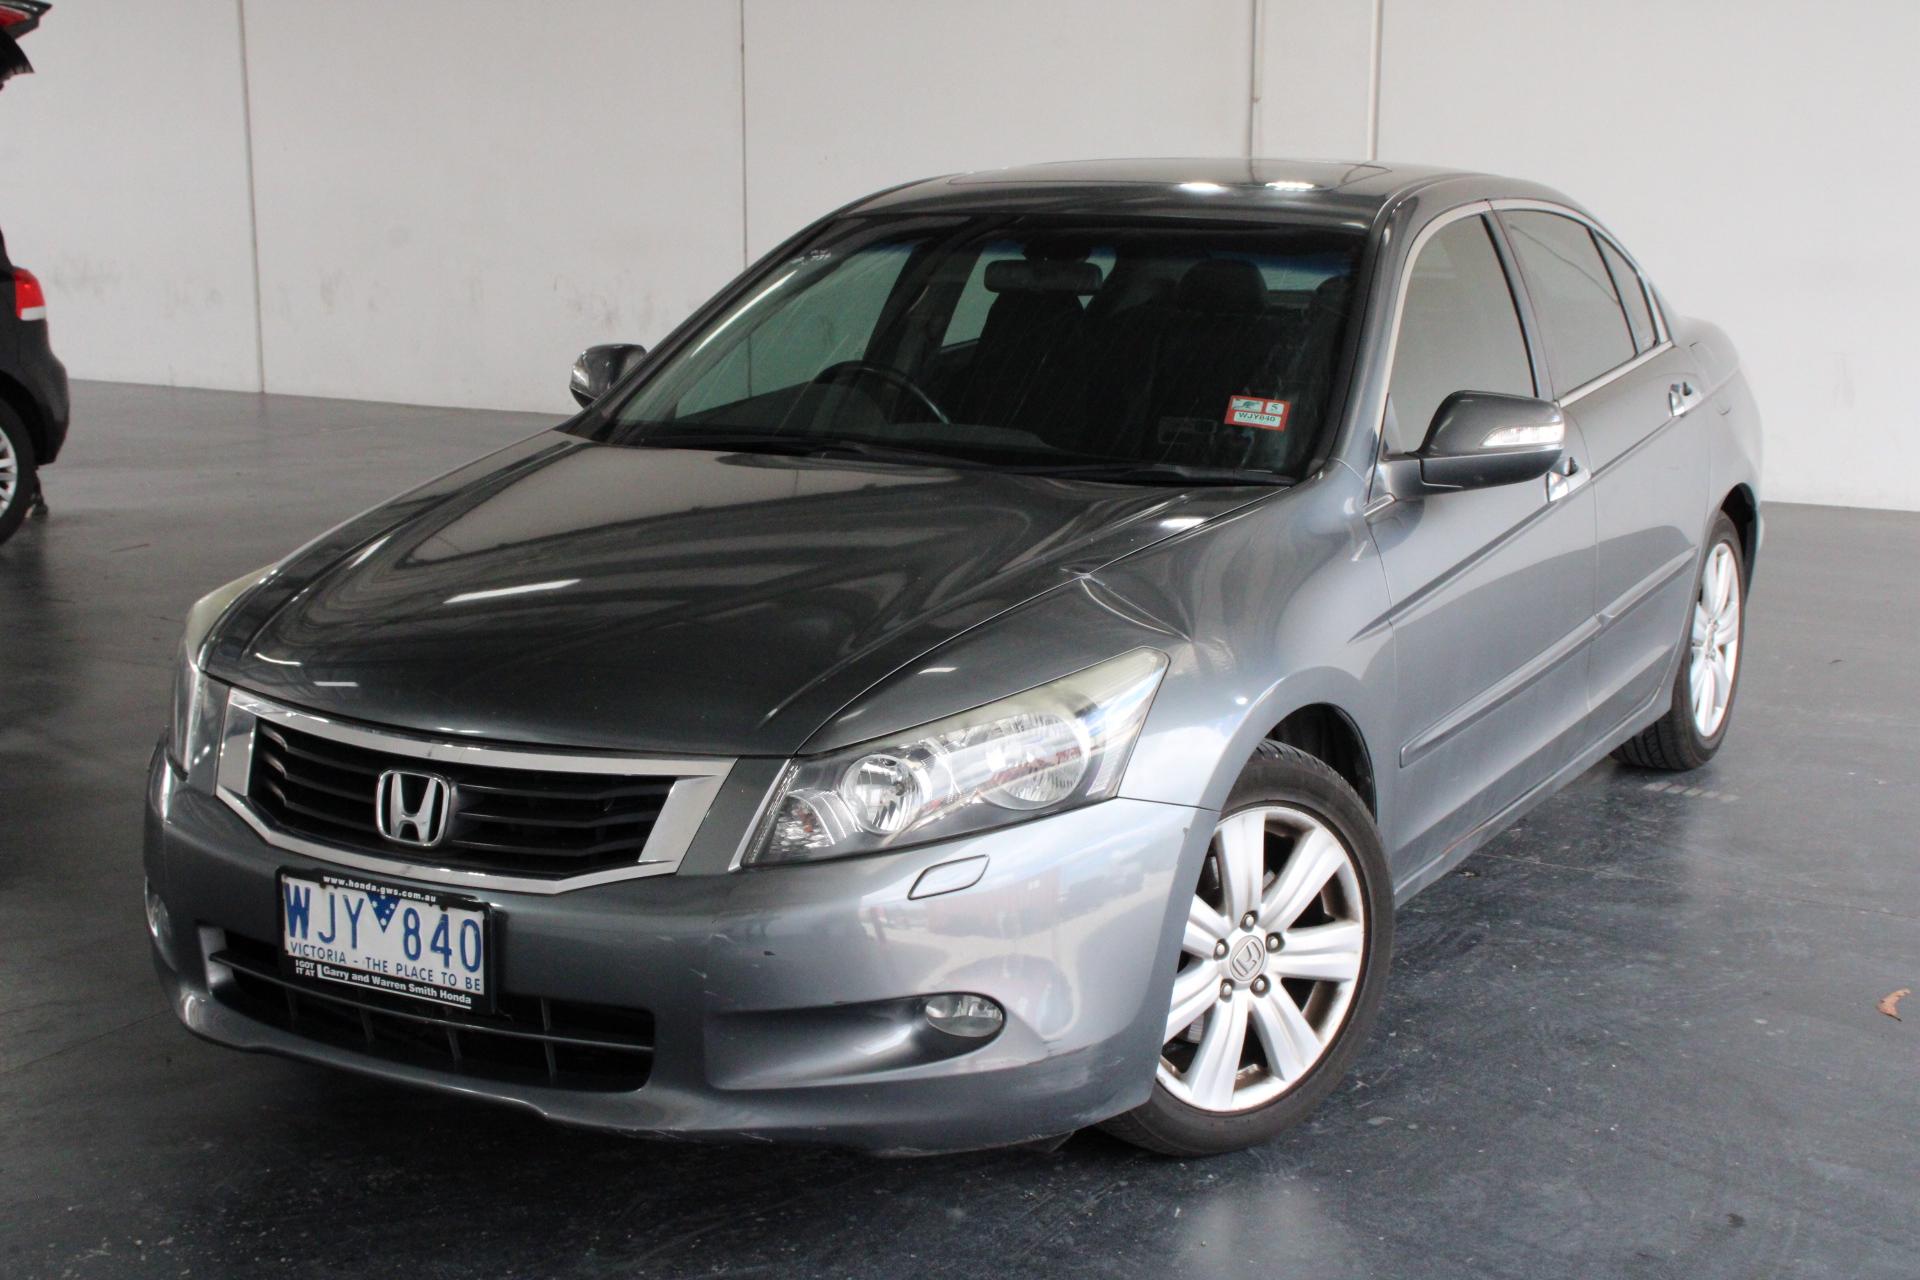 2008 Honda Accord V6 Luxury 8TH GEN Automatic Sedan